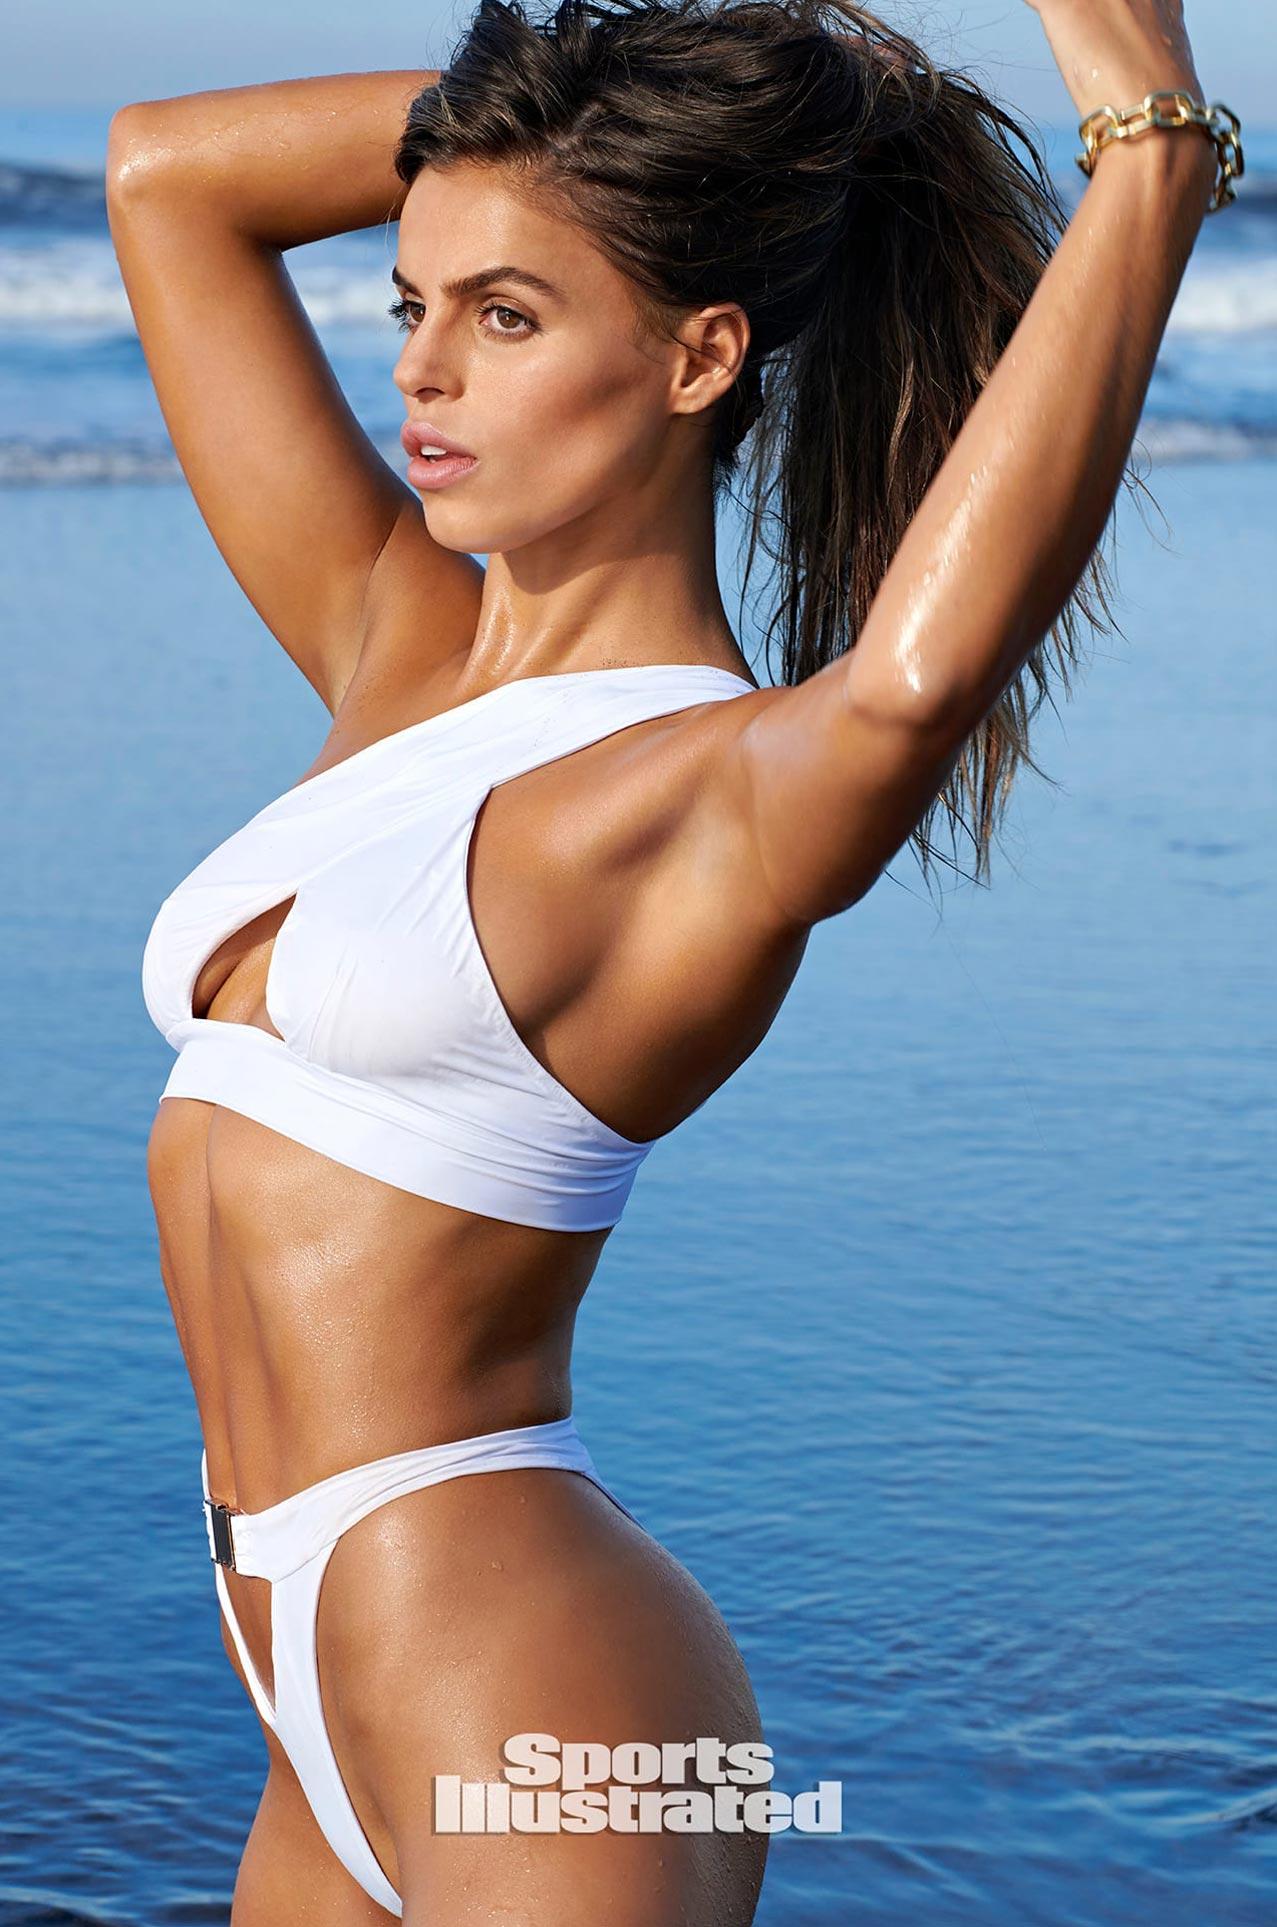 Брукс Надер в каталоге купальников Sports Illustrated Swimsuit 2020 / фото 26